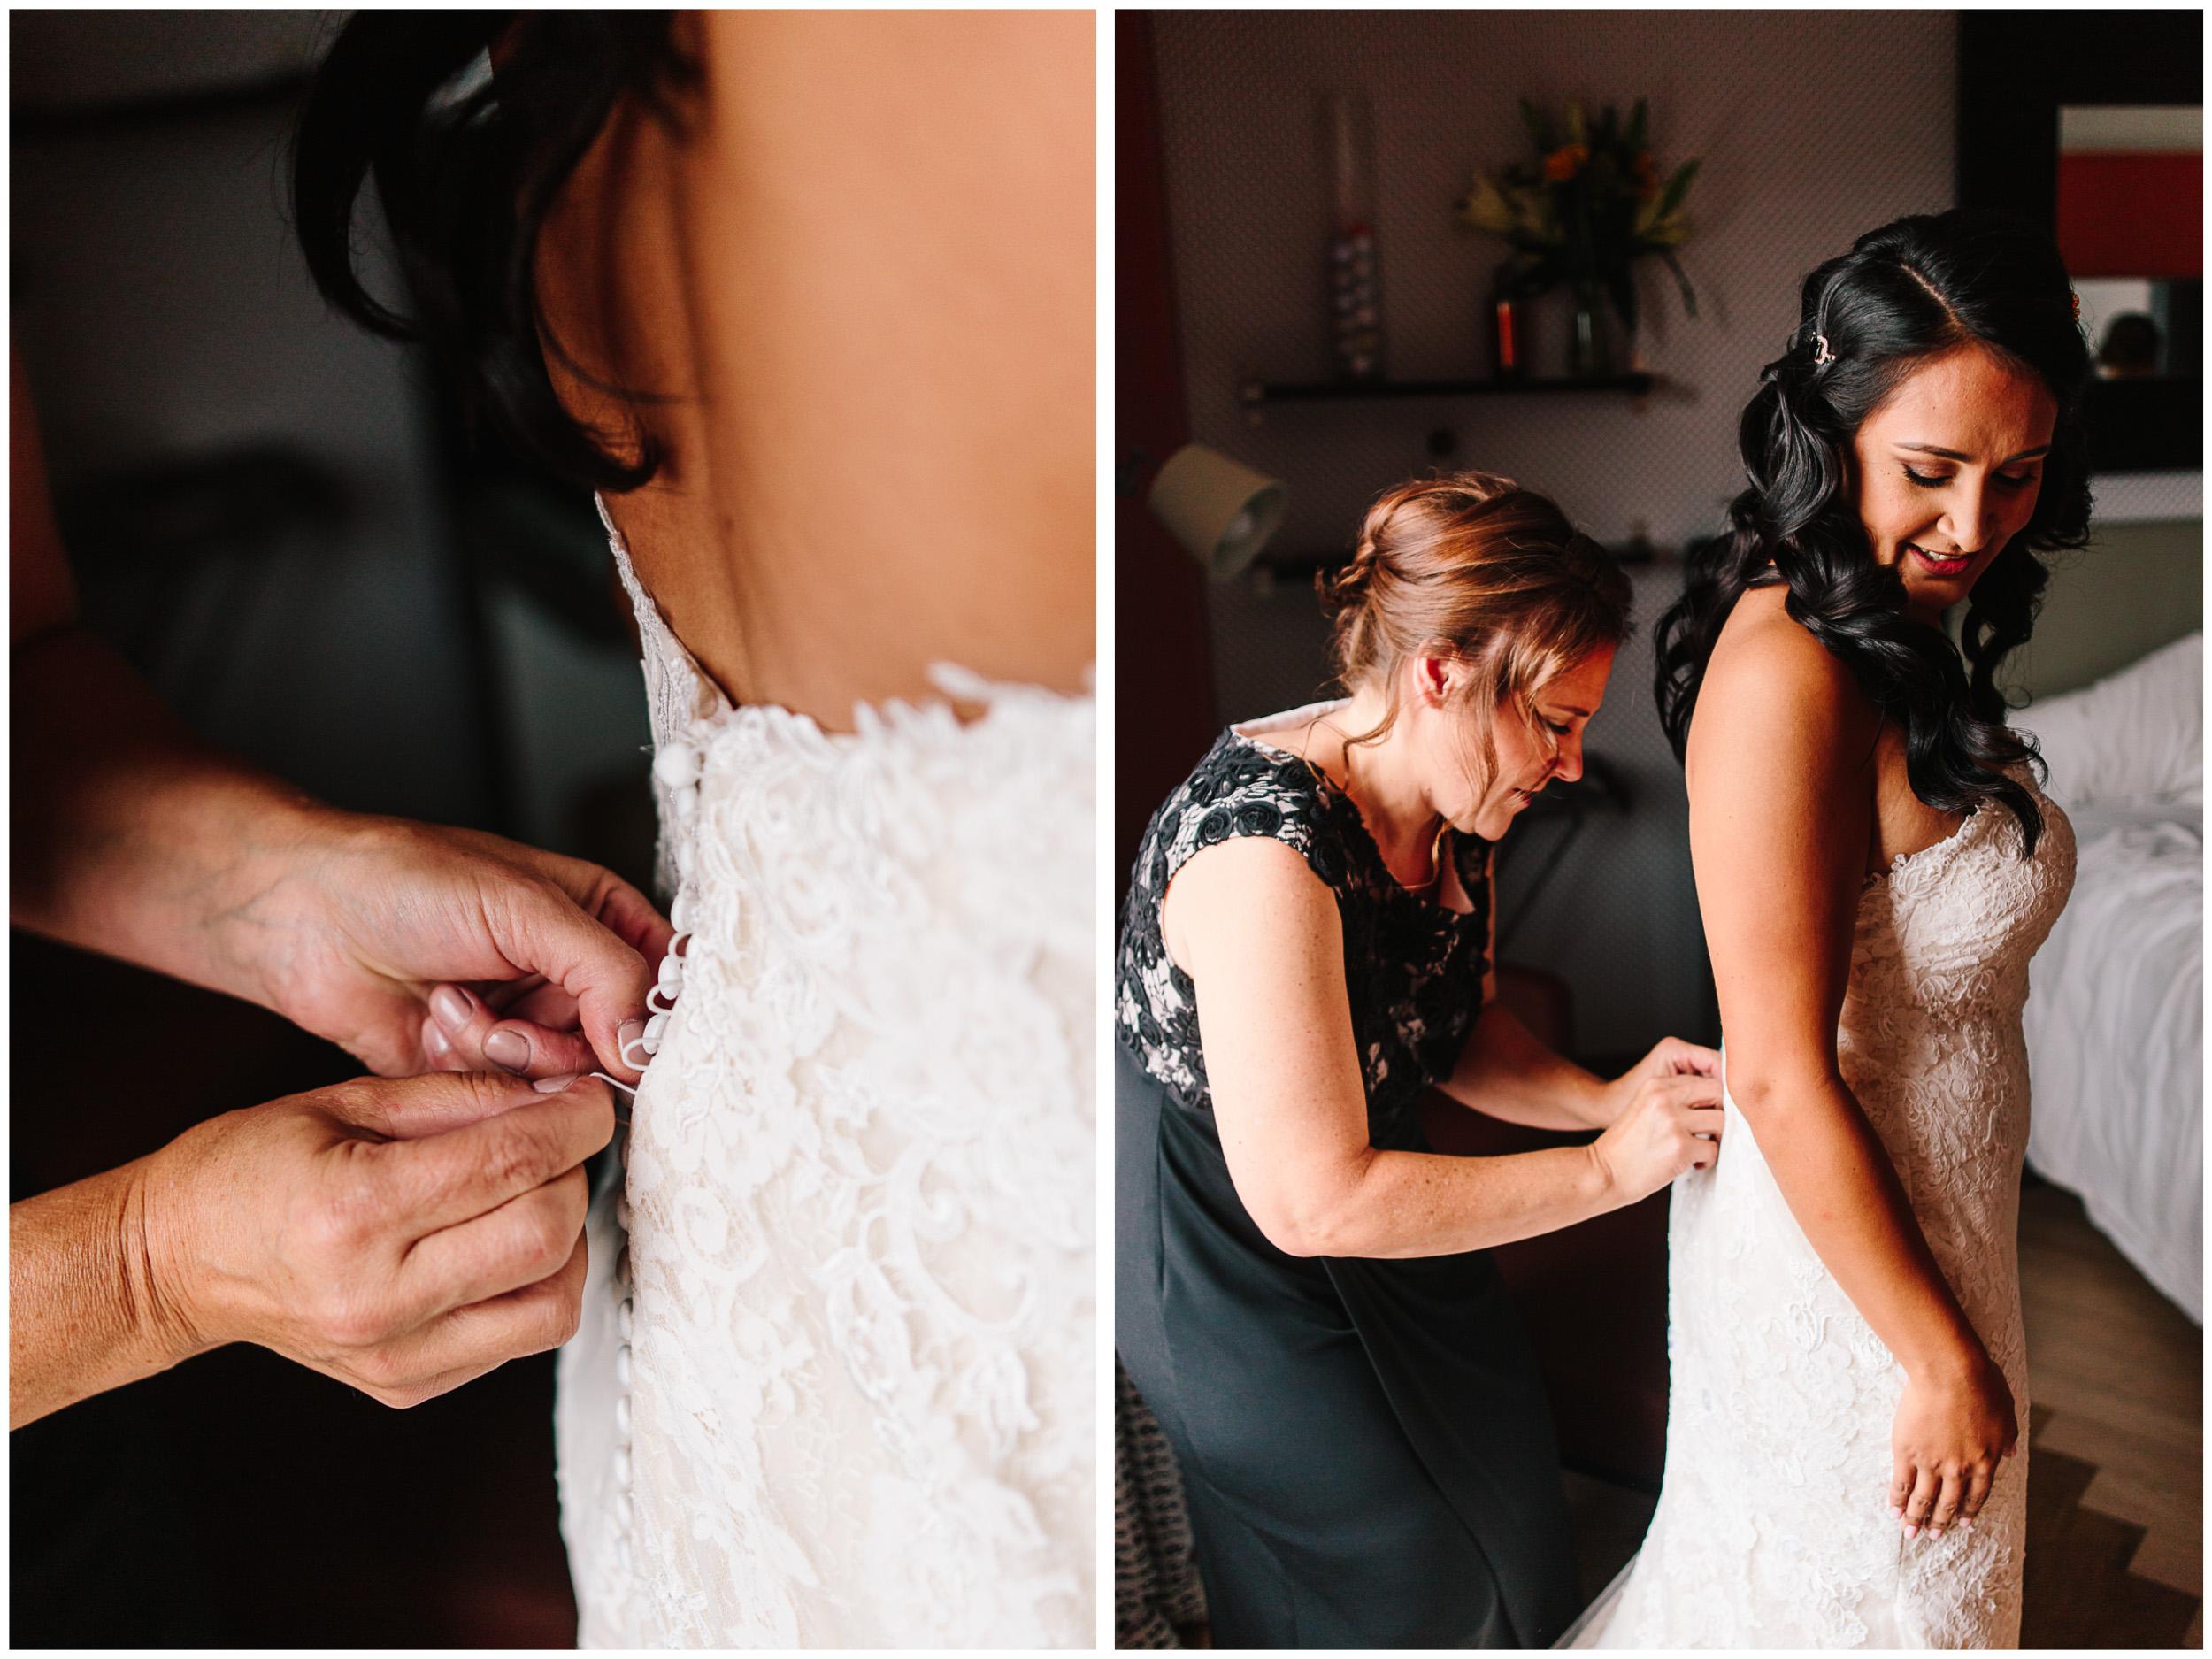 moss_denver_wedding_10.jpg